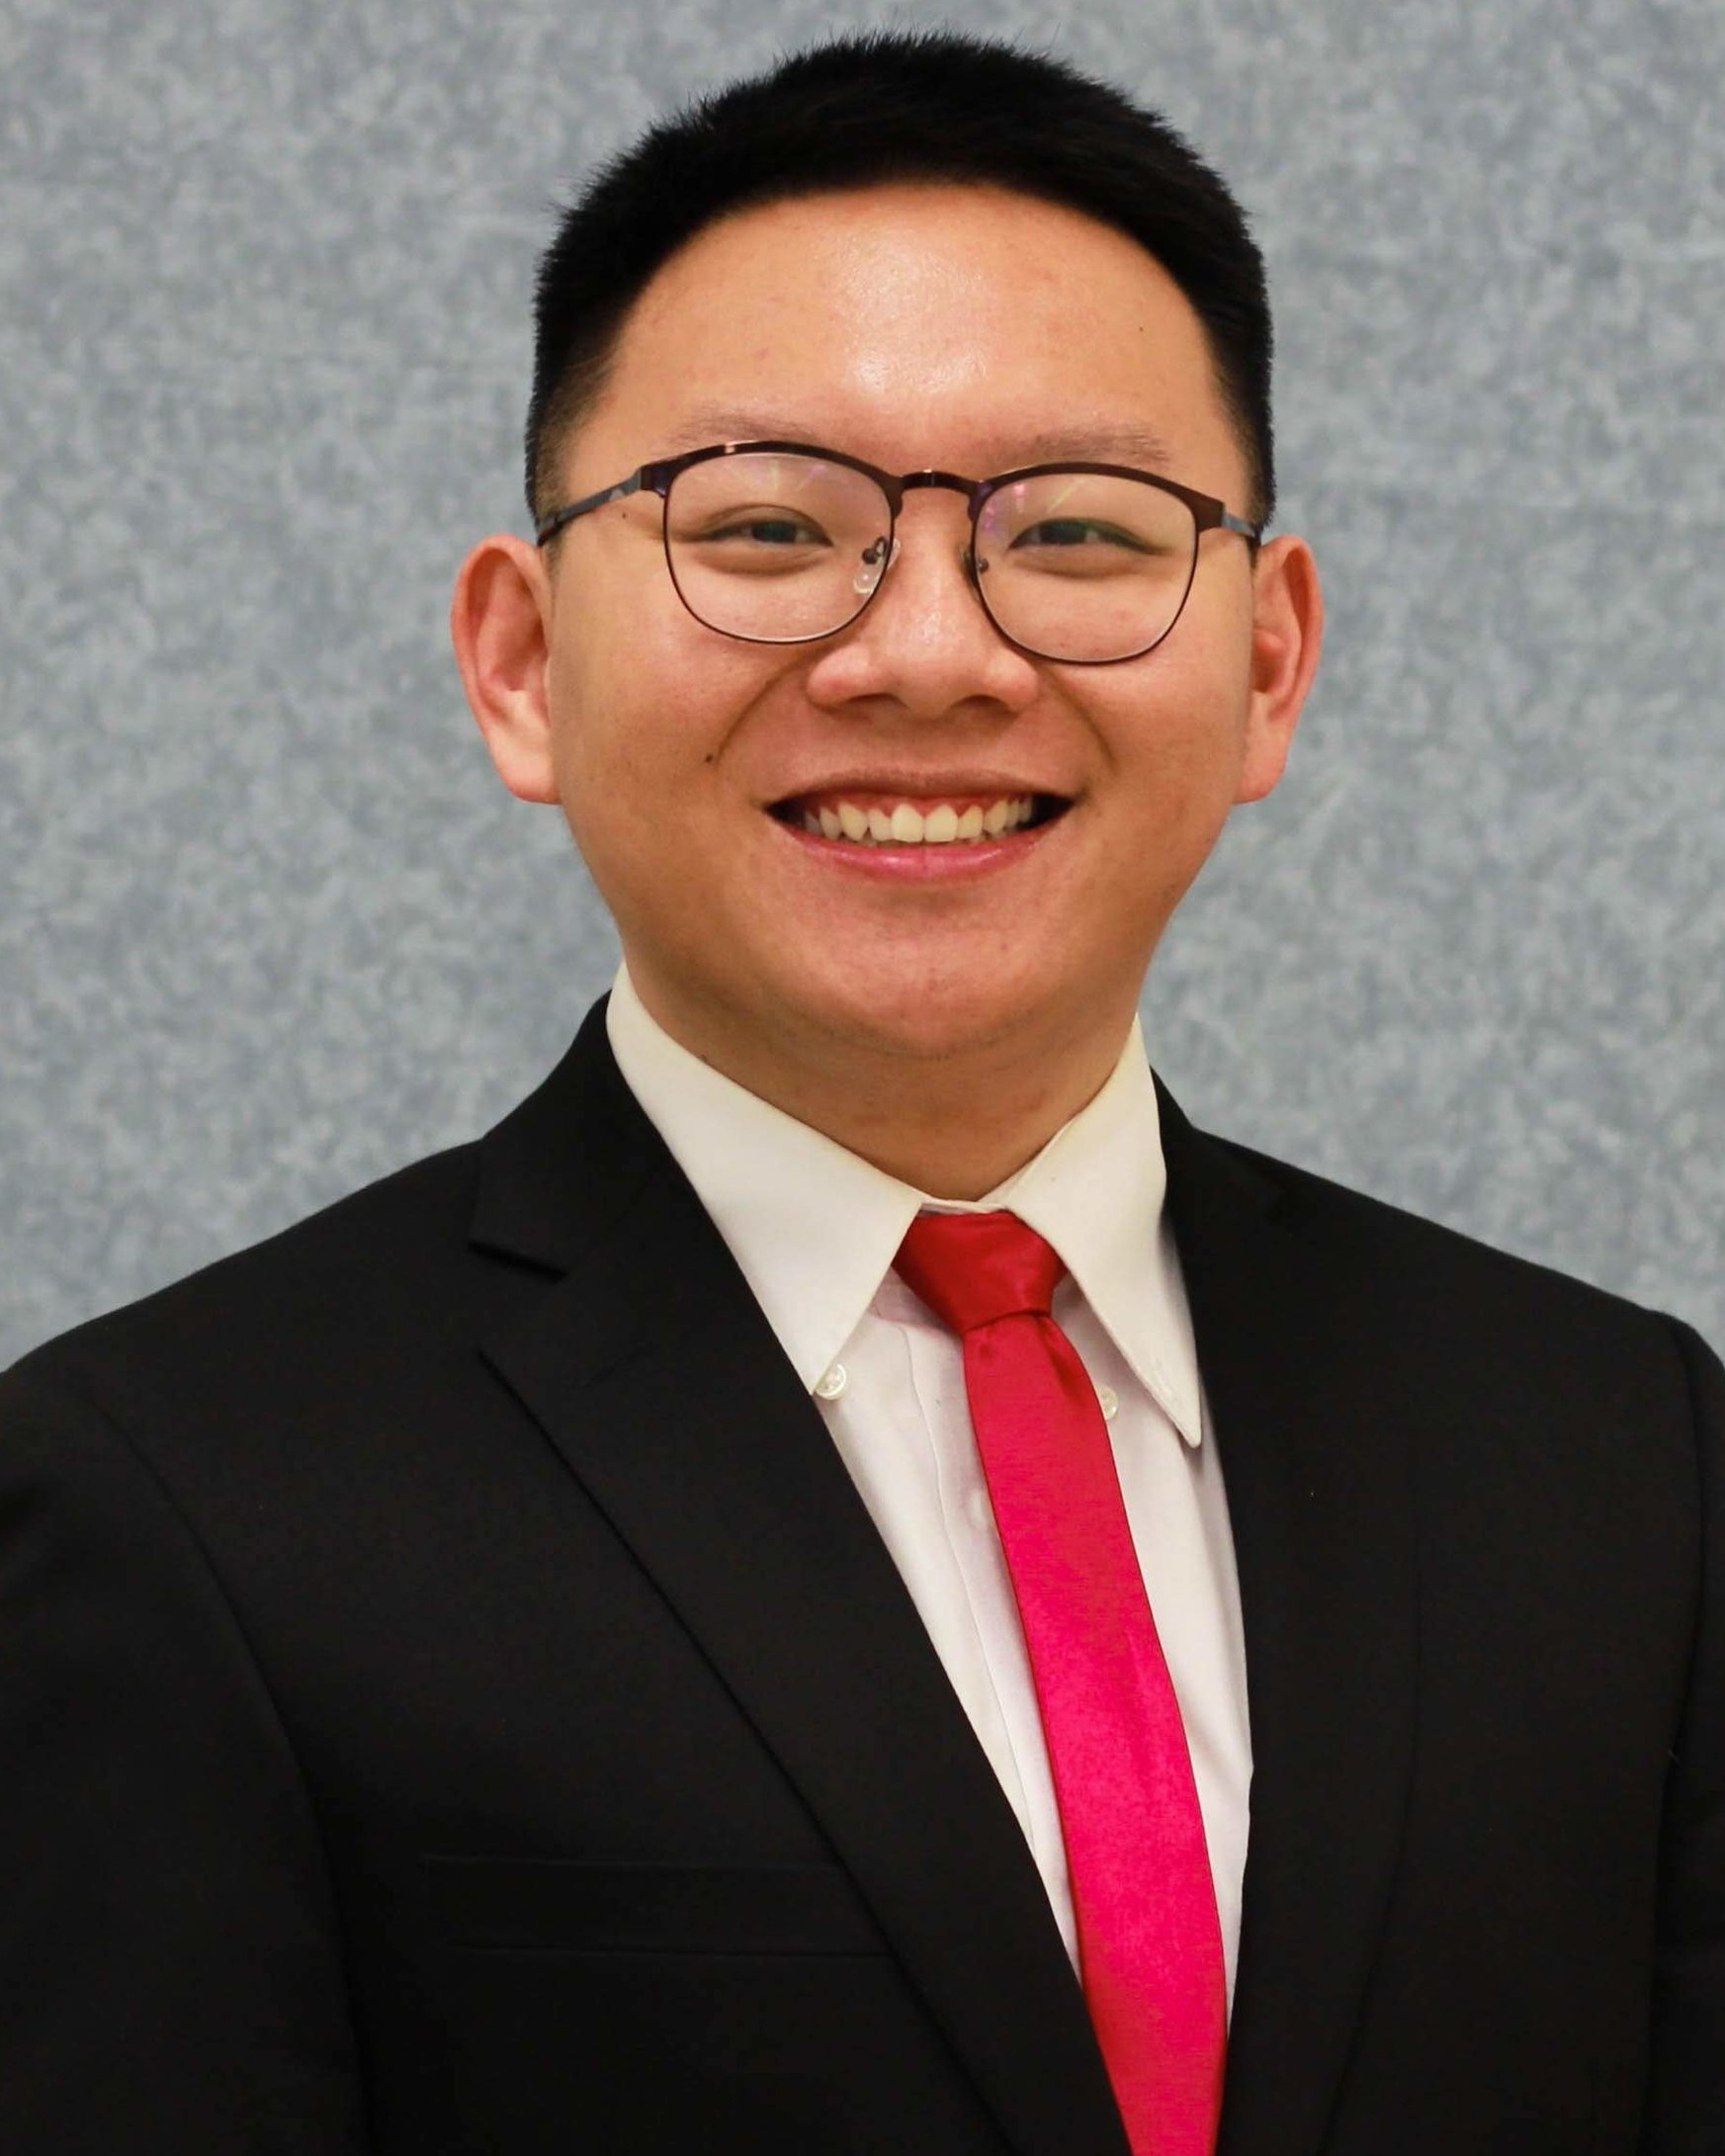 Zhanchong Max Li - Regent